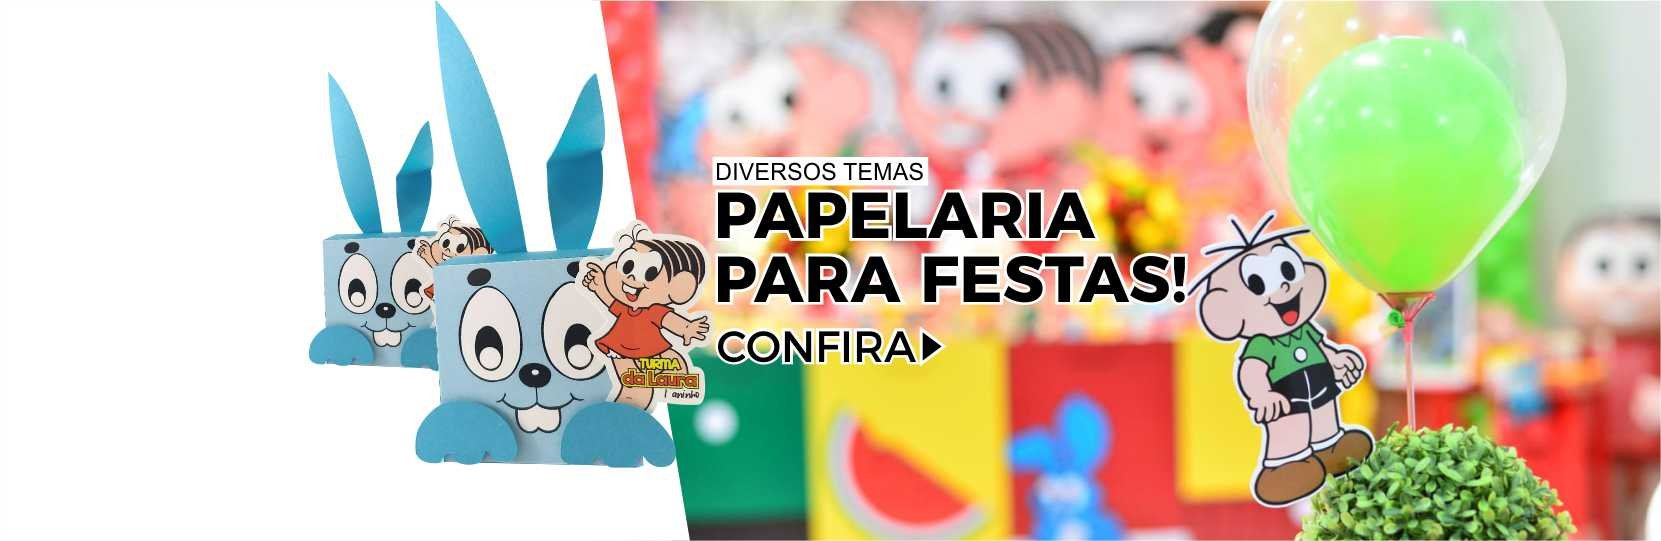 Banner Festa Personalizada